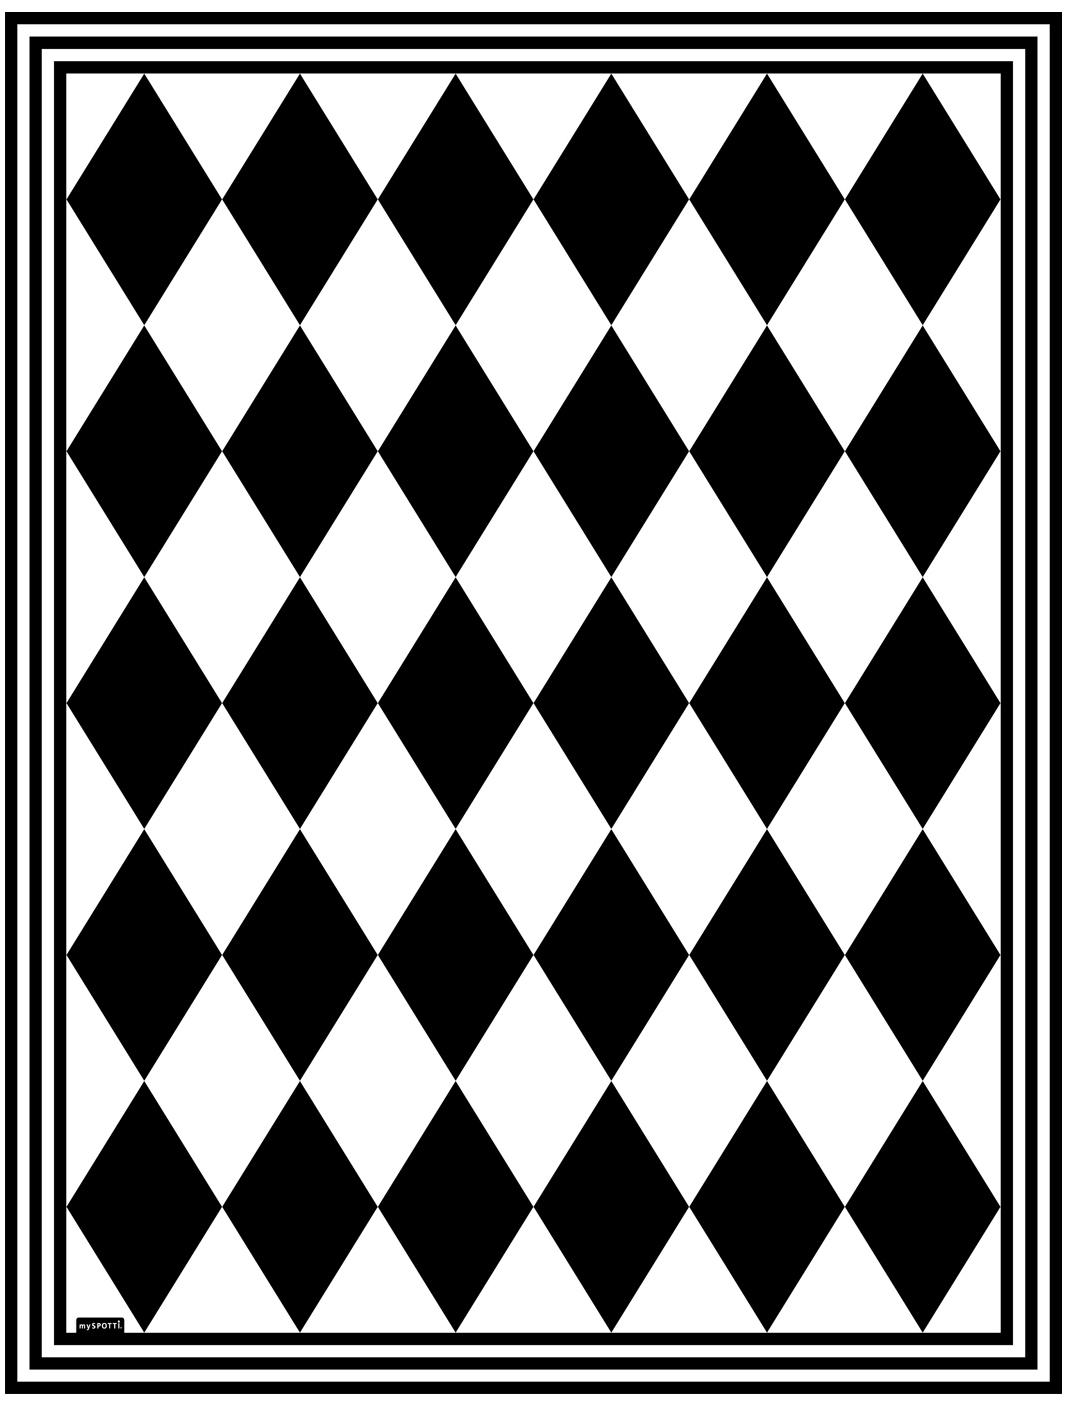 Tappetino in vinile Bobby II, Vinile riciclabile, Nero, bianco, Larg. 65 x Lung. 85 cm